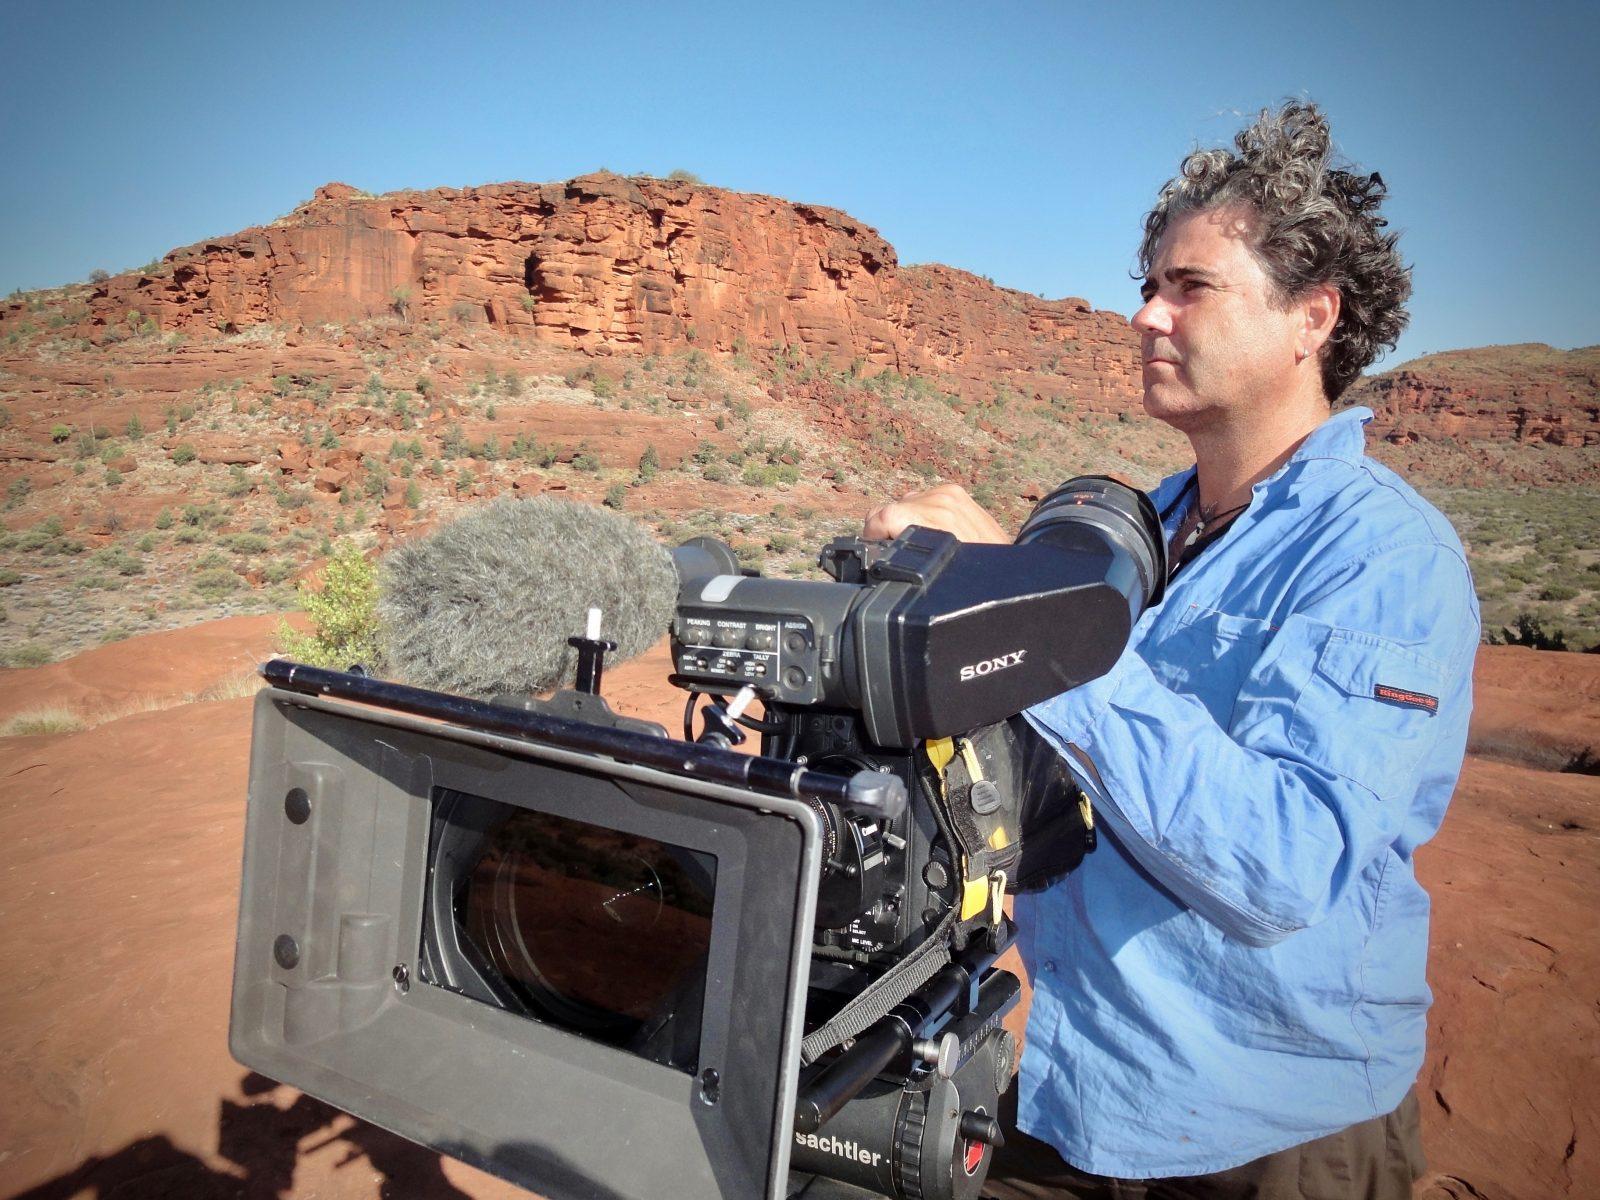 jens-westphalen-filmemacher-outback-australien-zorillafilm-grospitz-westphalen